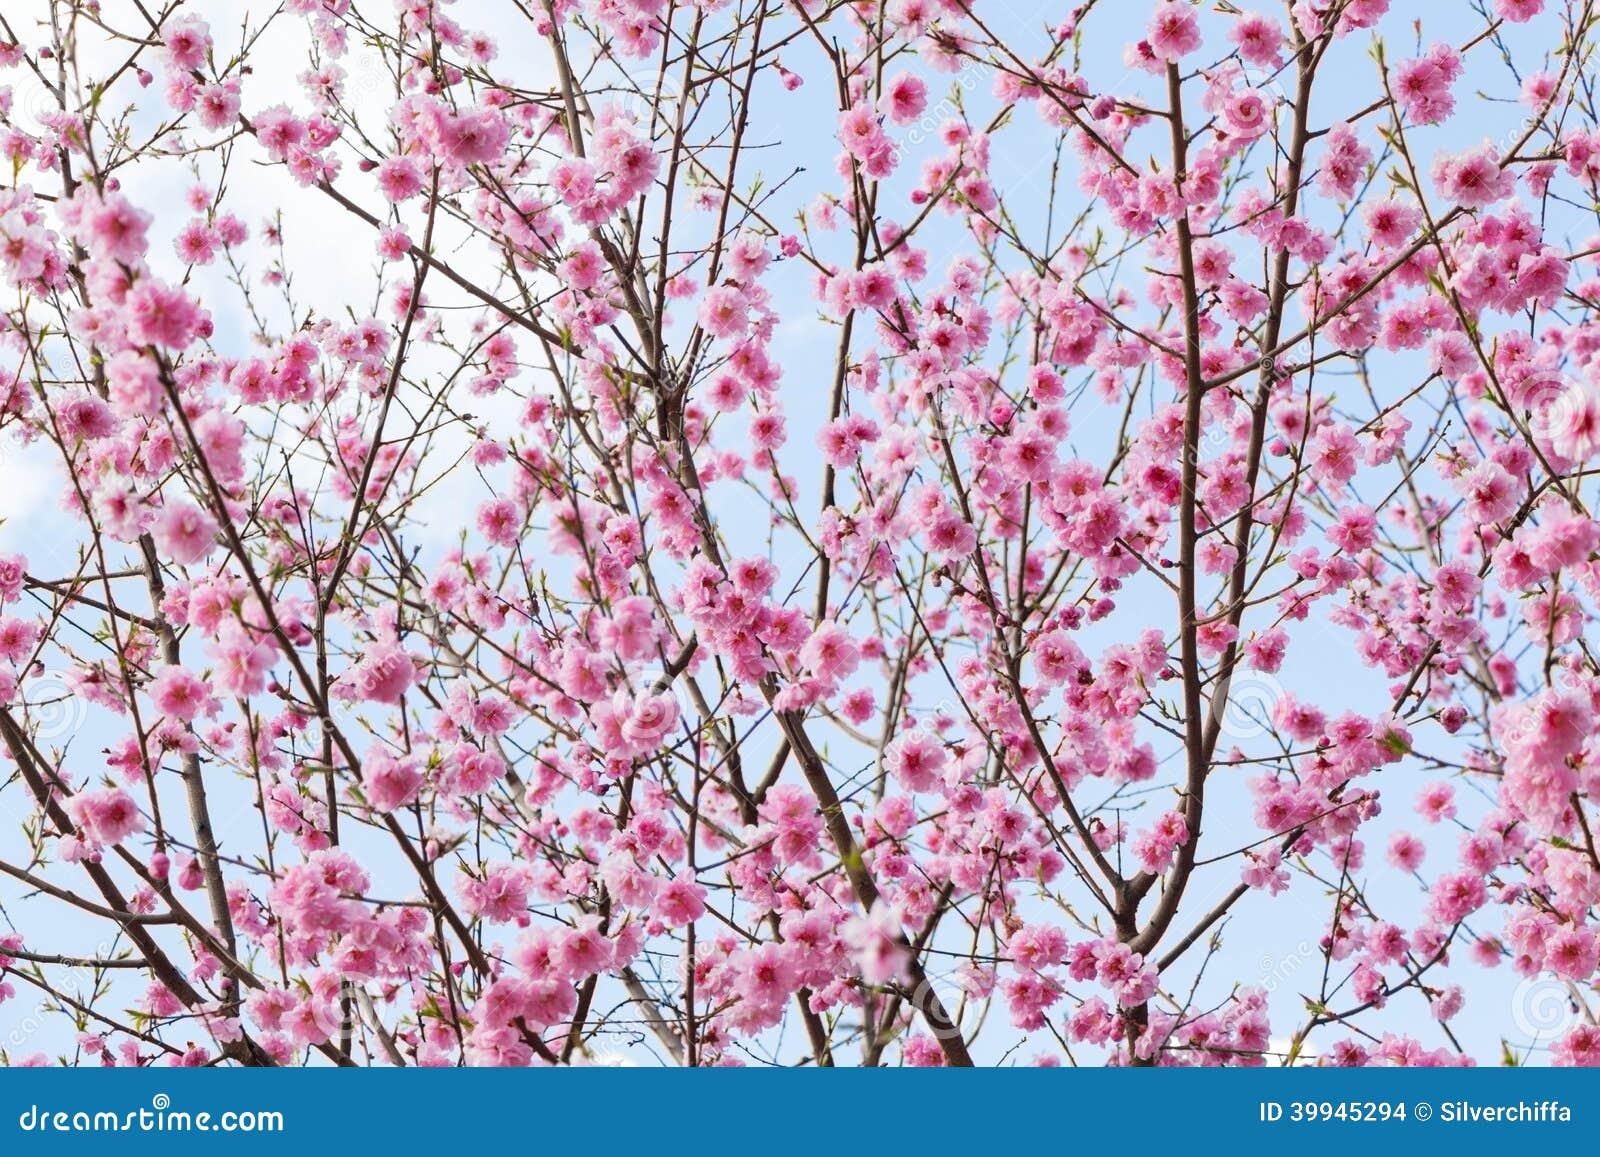 blossom park tree pink - photo #13